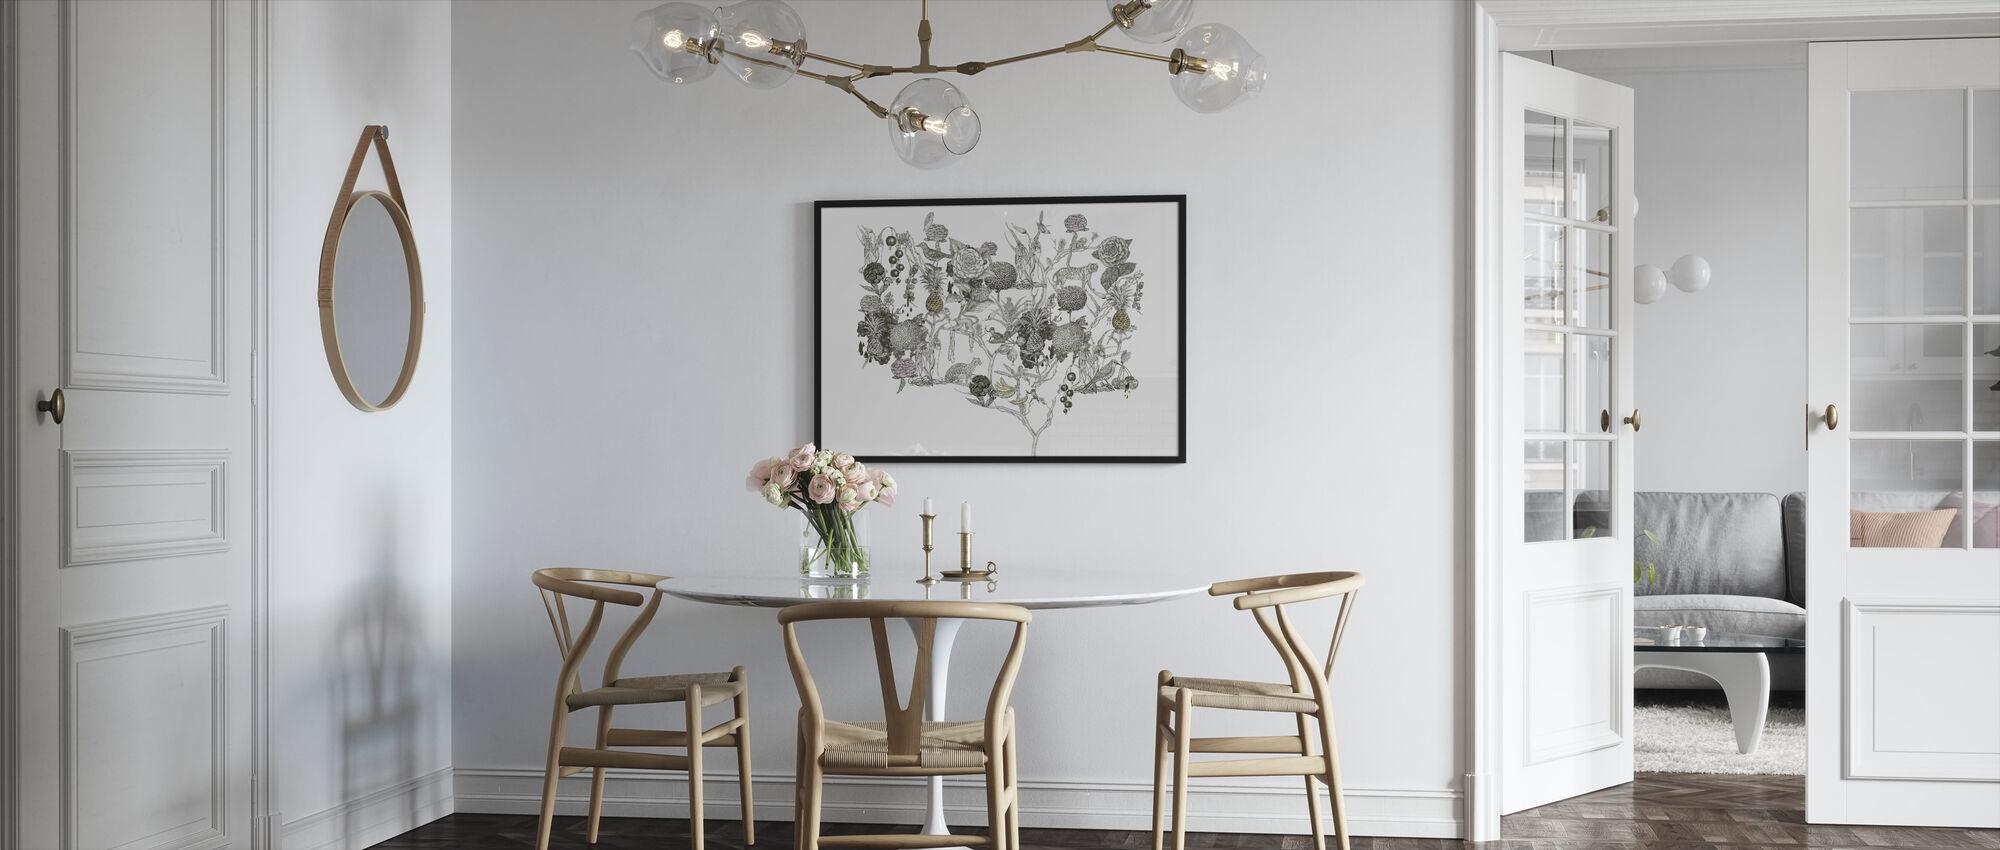 Wild at Heart 4 - Framed print - Kitchen